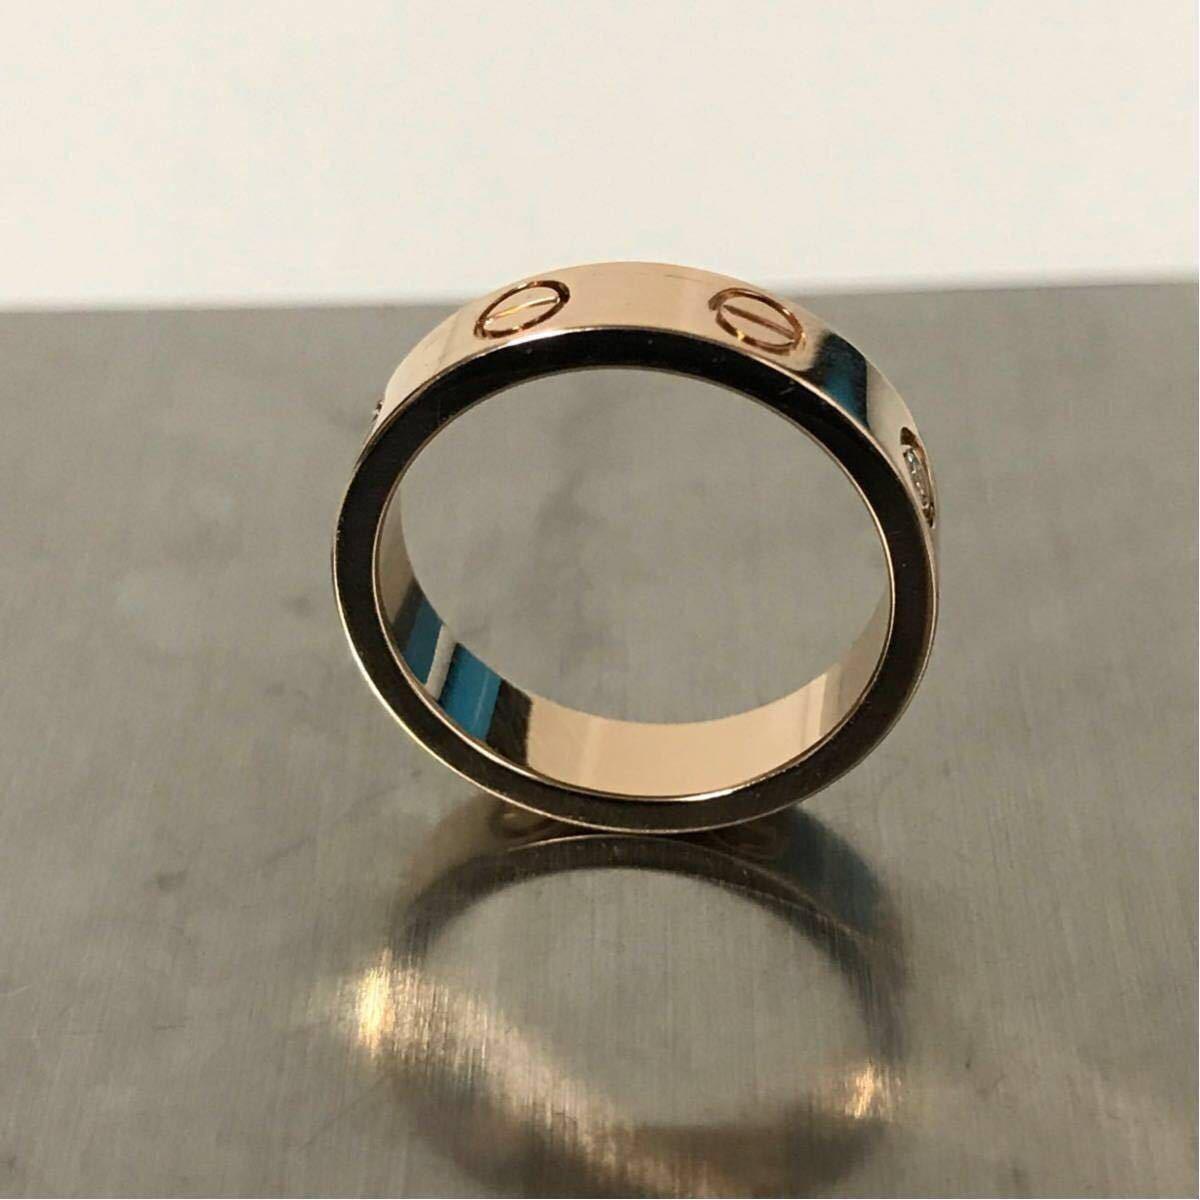 Cartier★カルティエ ラブリング★K18PG 1p ダイヤモンドリング 46 指輪 ウエディング ピンクゴールド_画像3